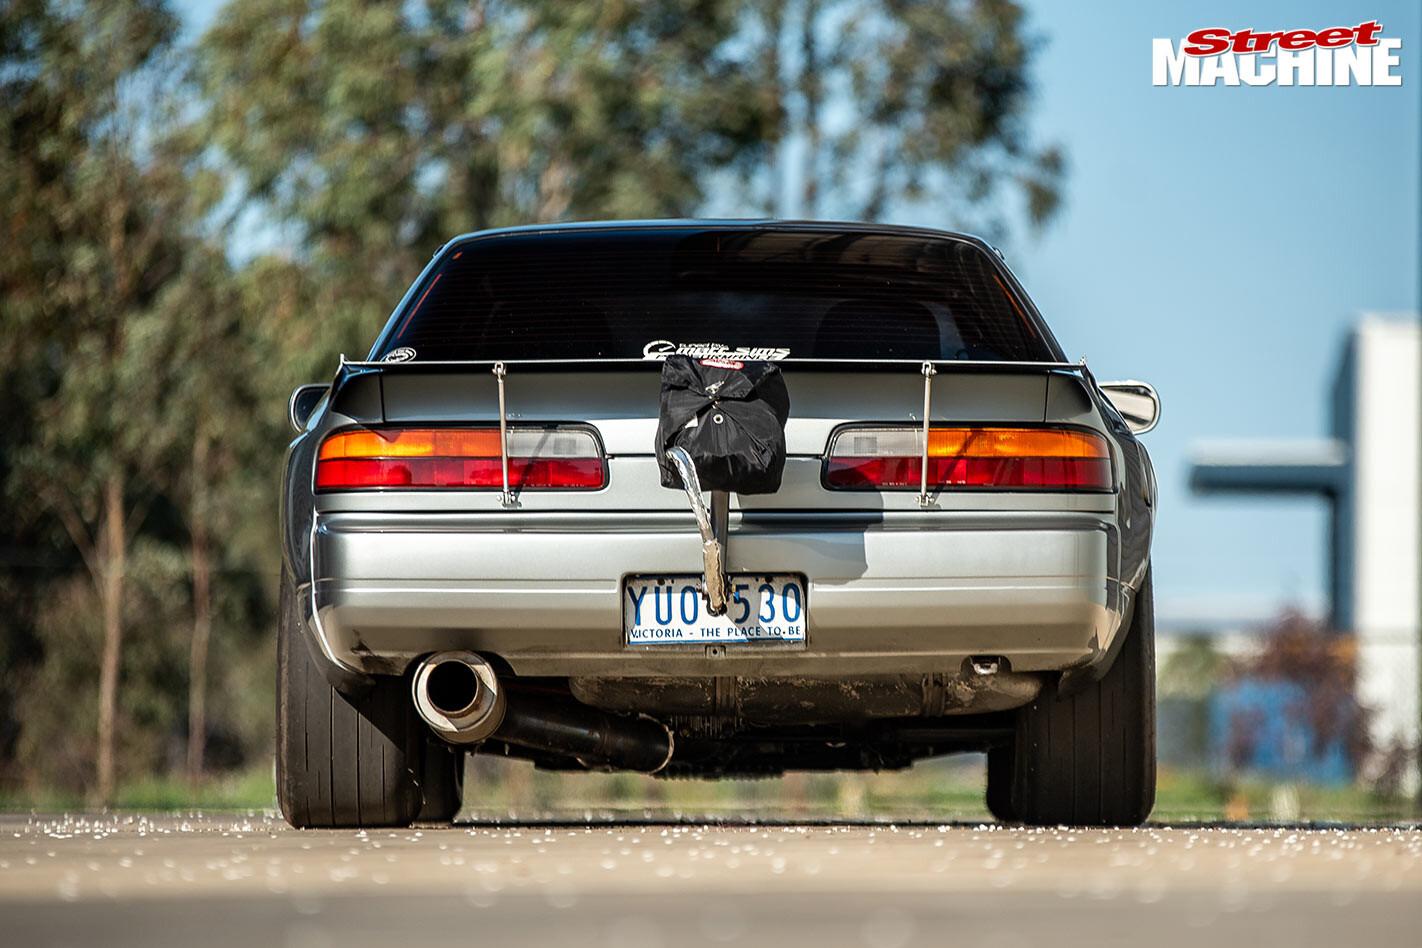 Nissan Silvia rear